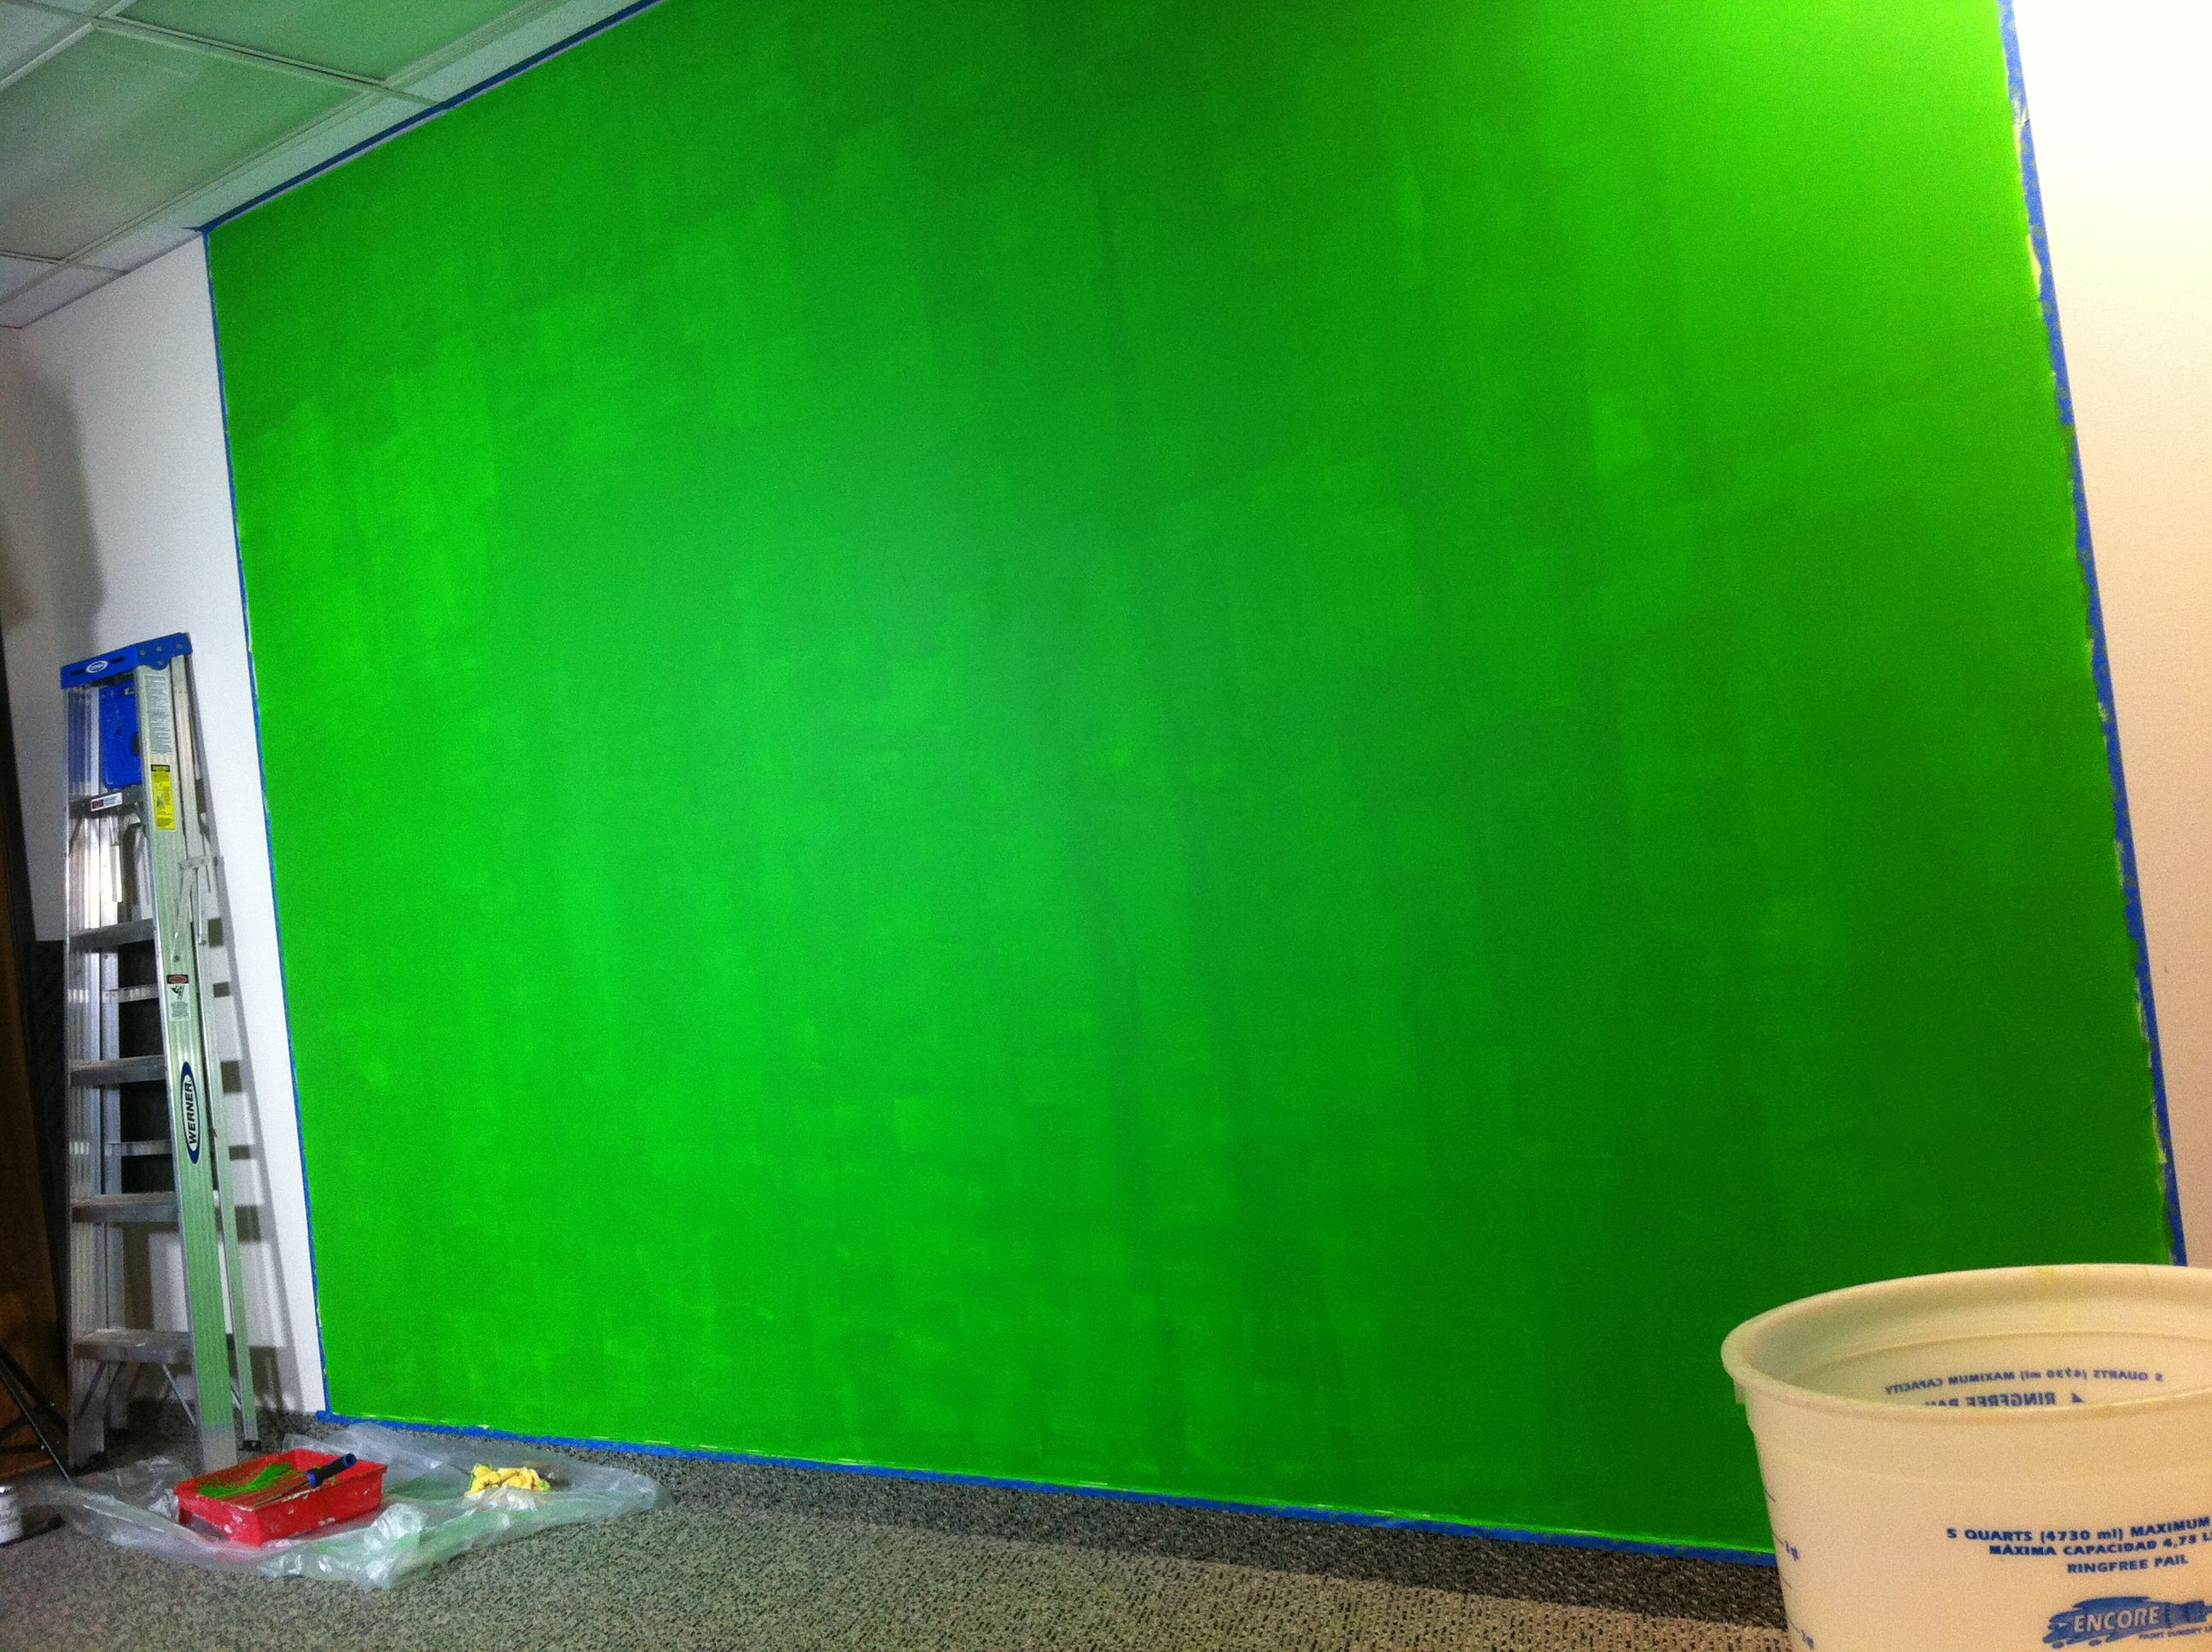 Neon Green Paint Walls Chroma Key Screen Wall